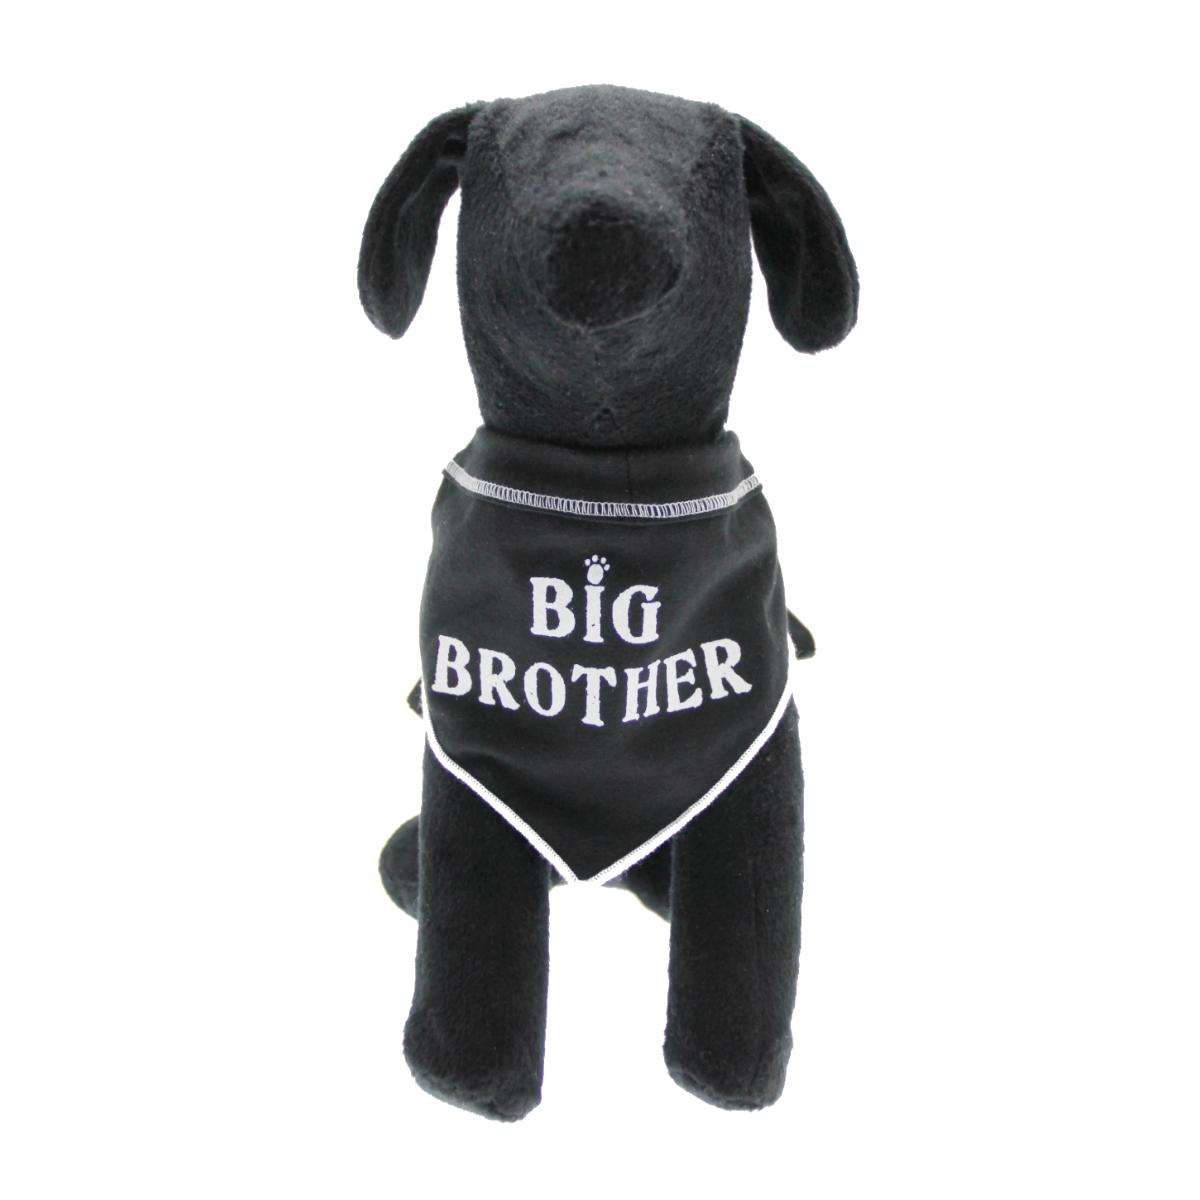 Big Brother Dog Bandana Scarf